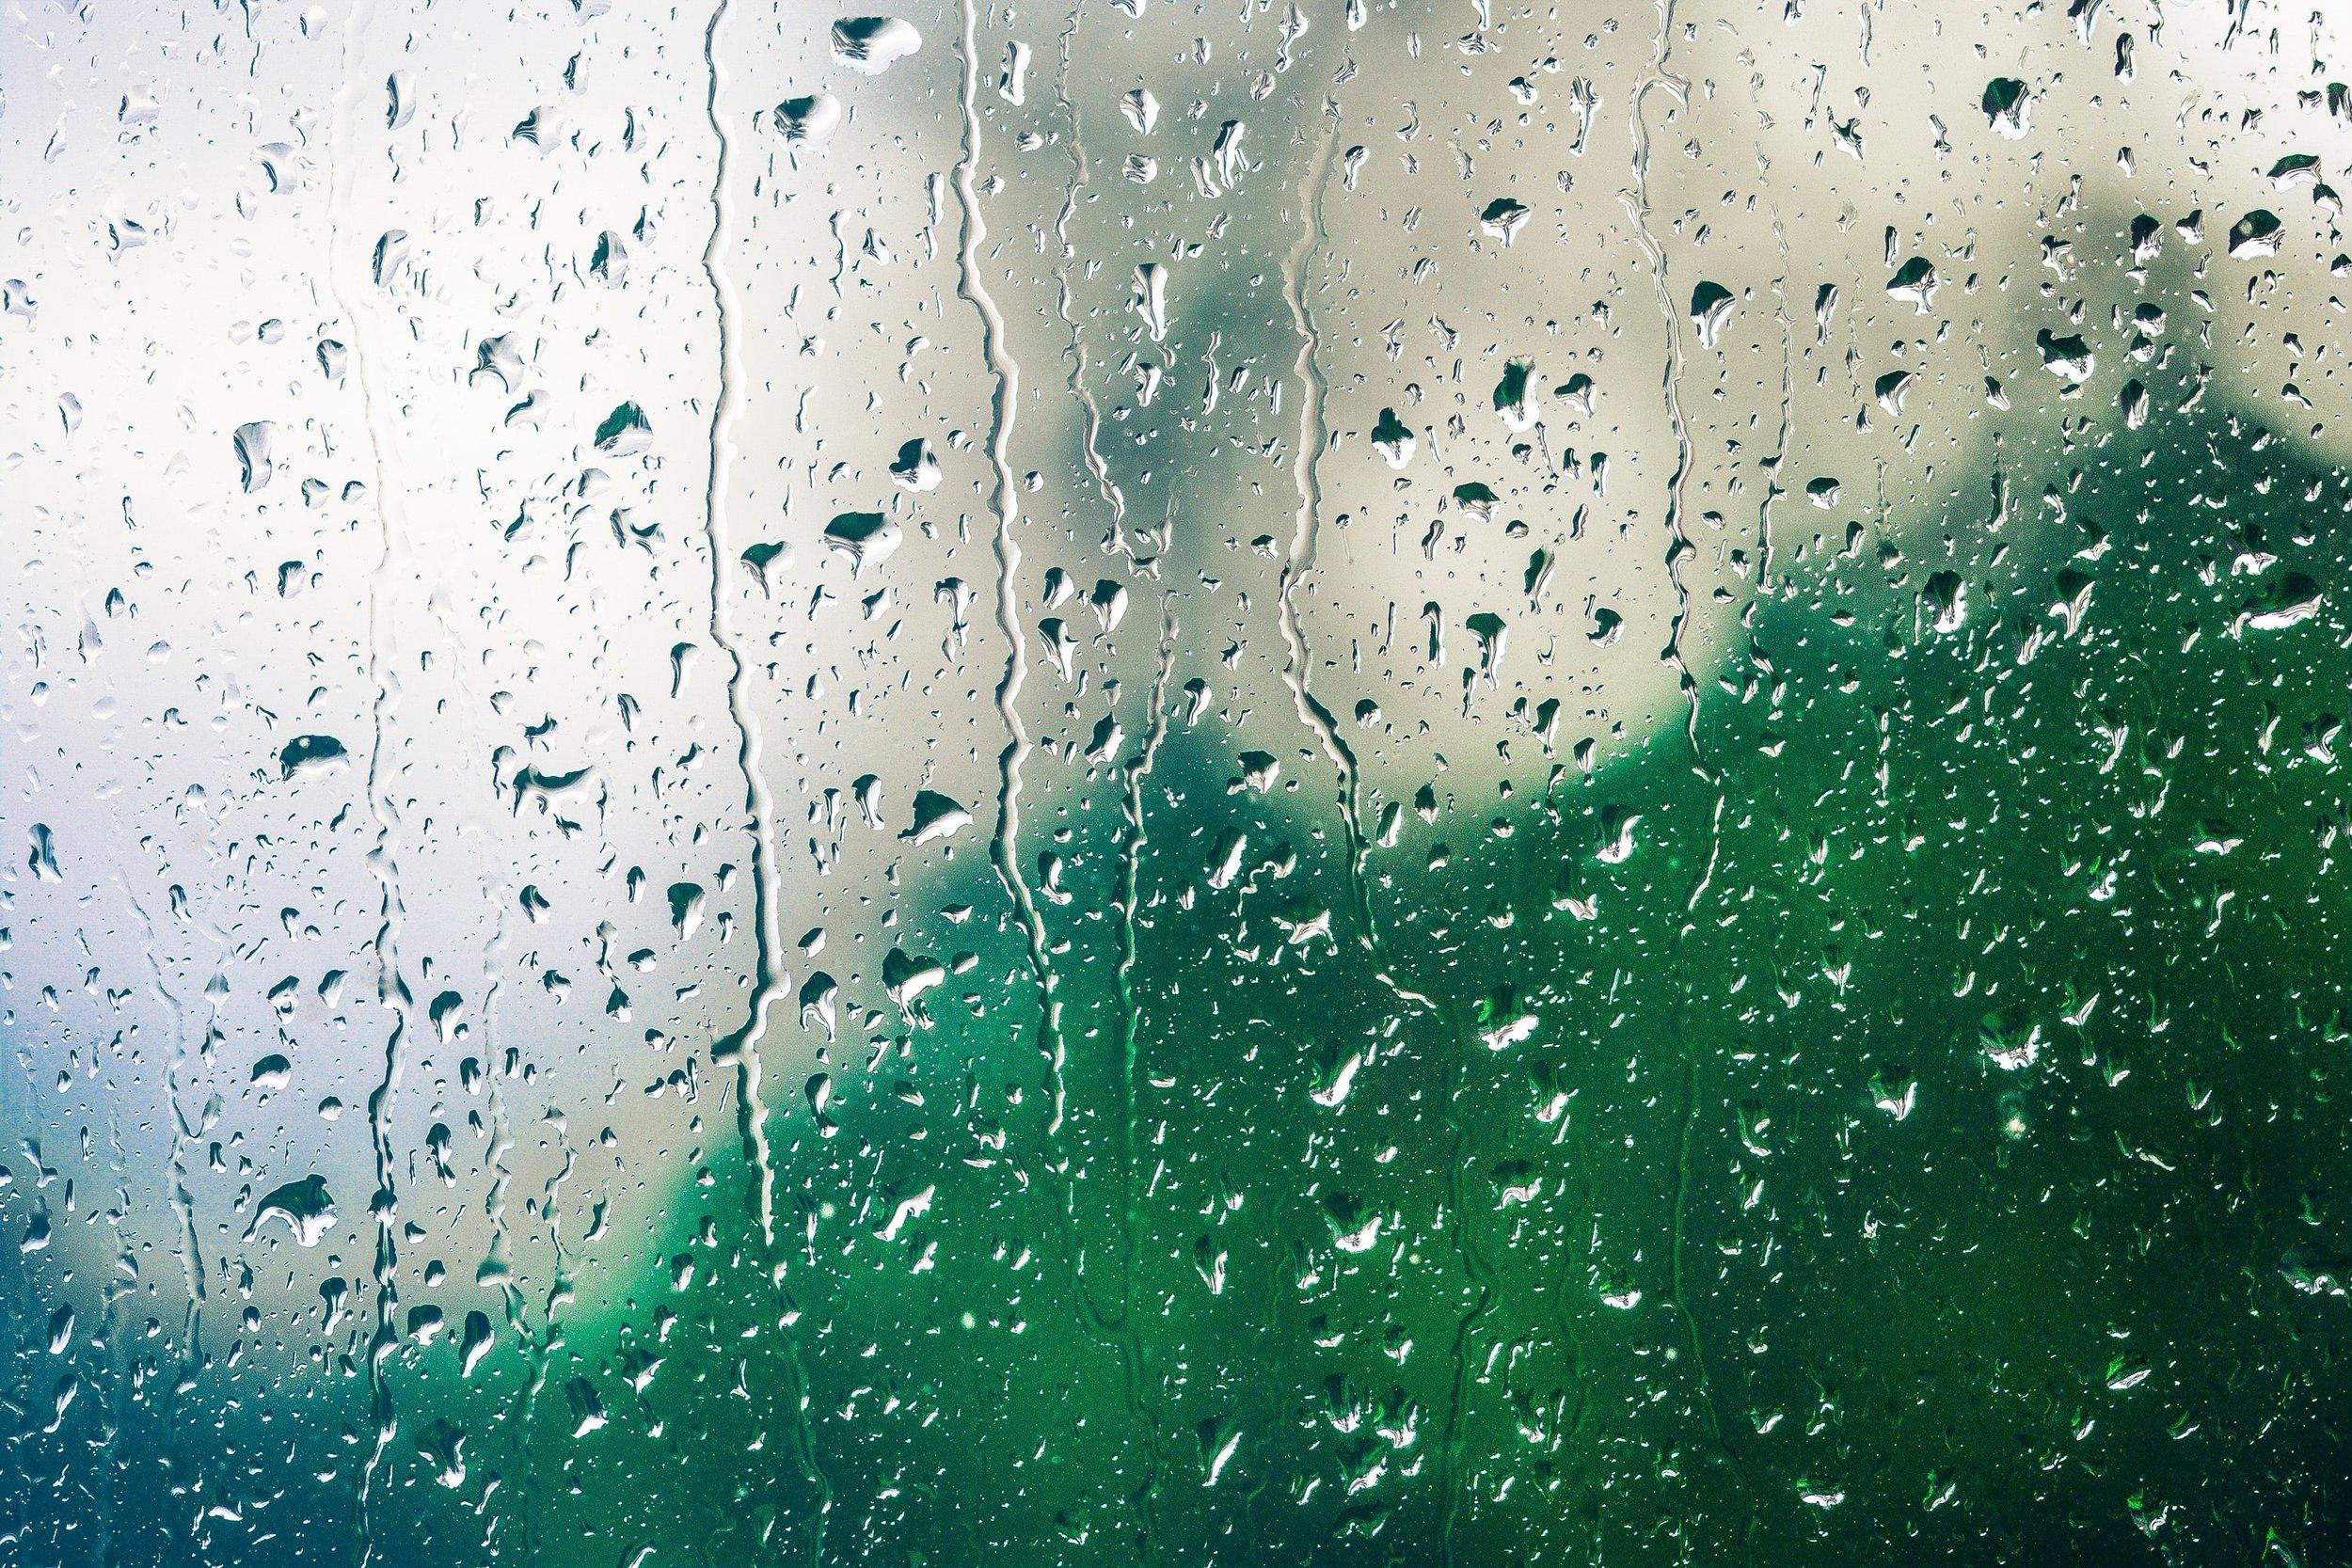 dew-glass-rain-531906.jpg